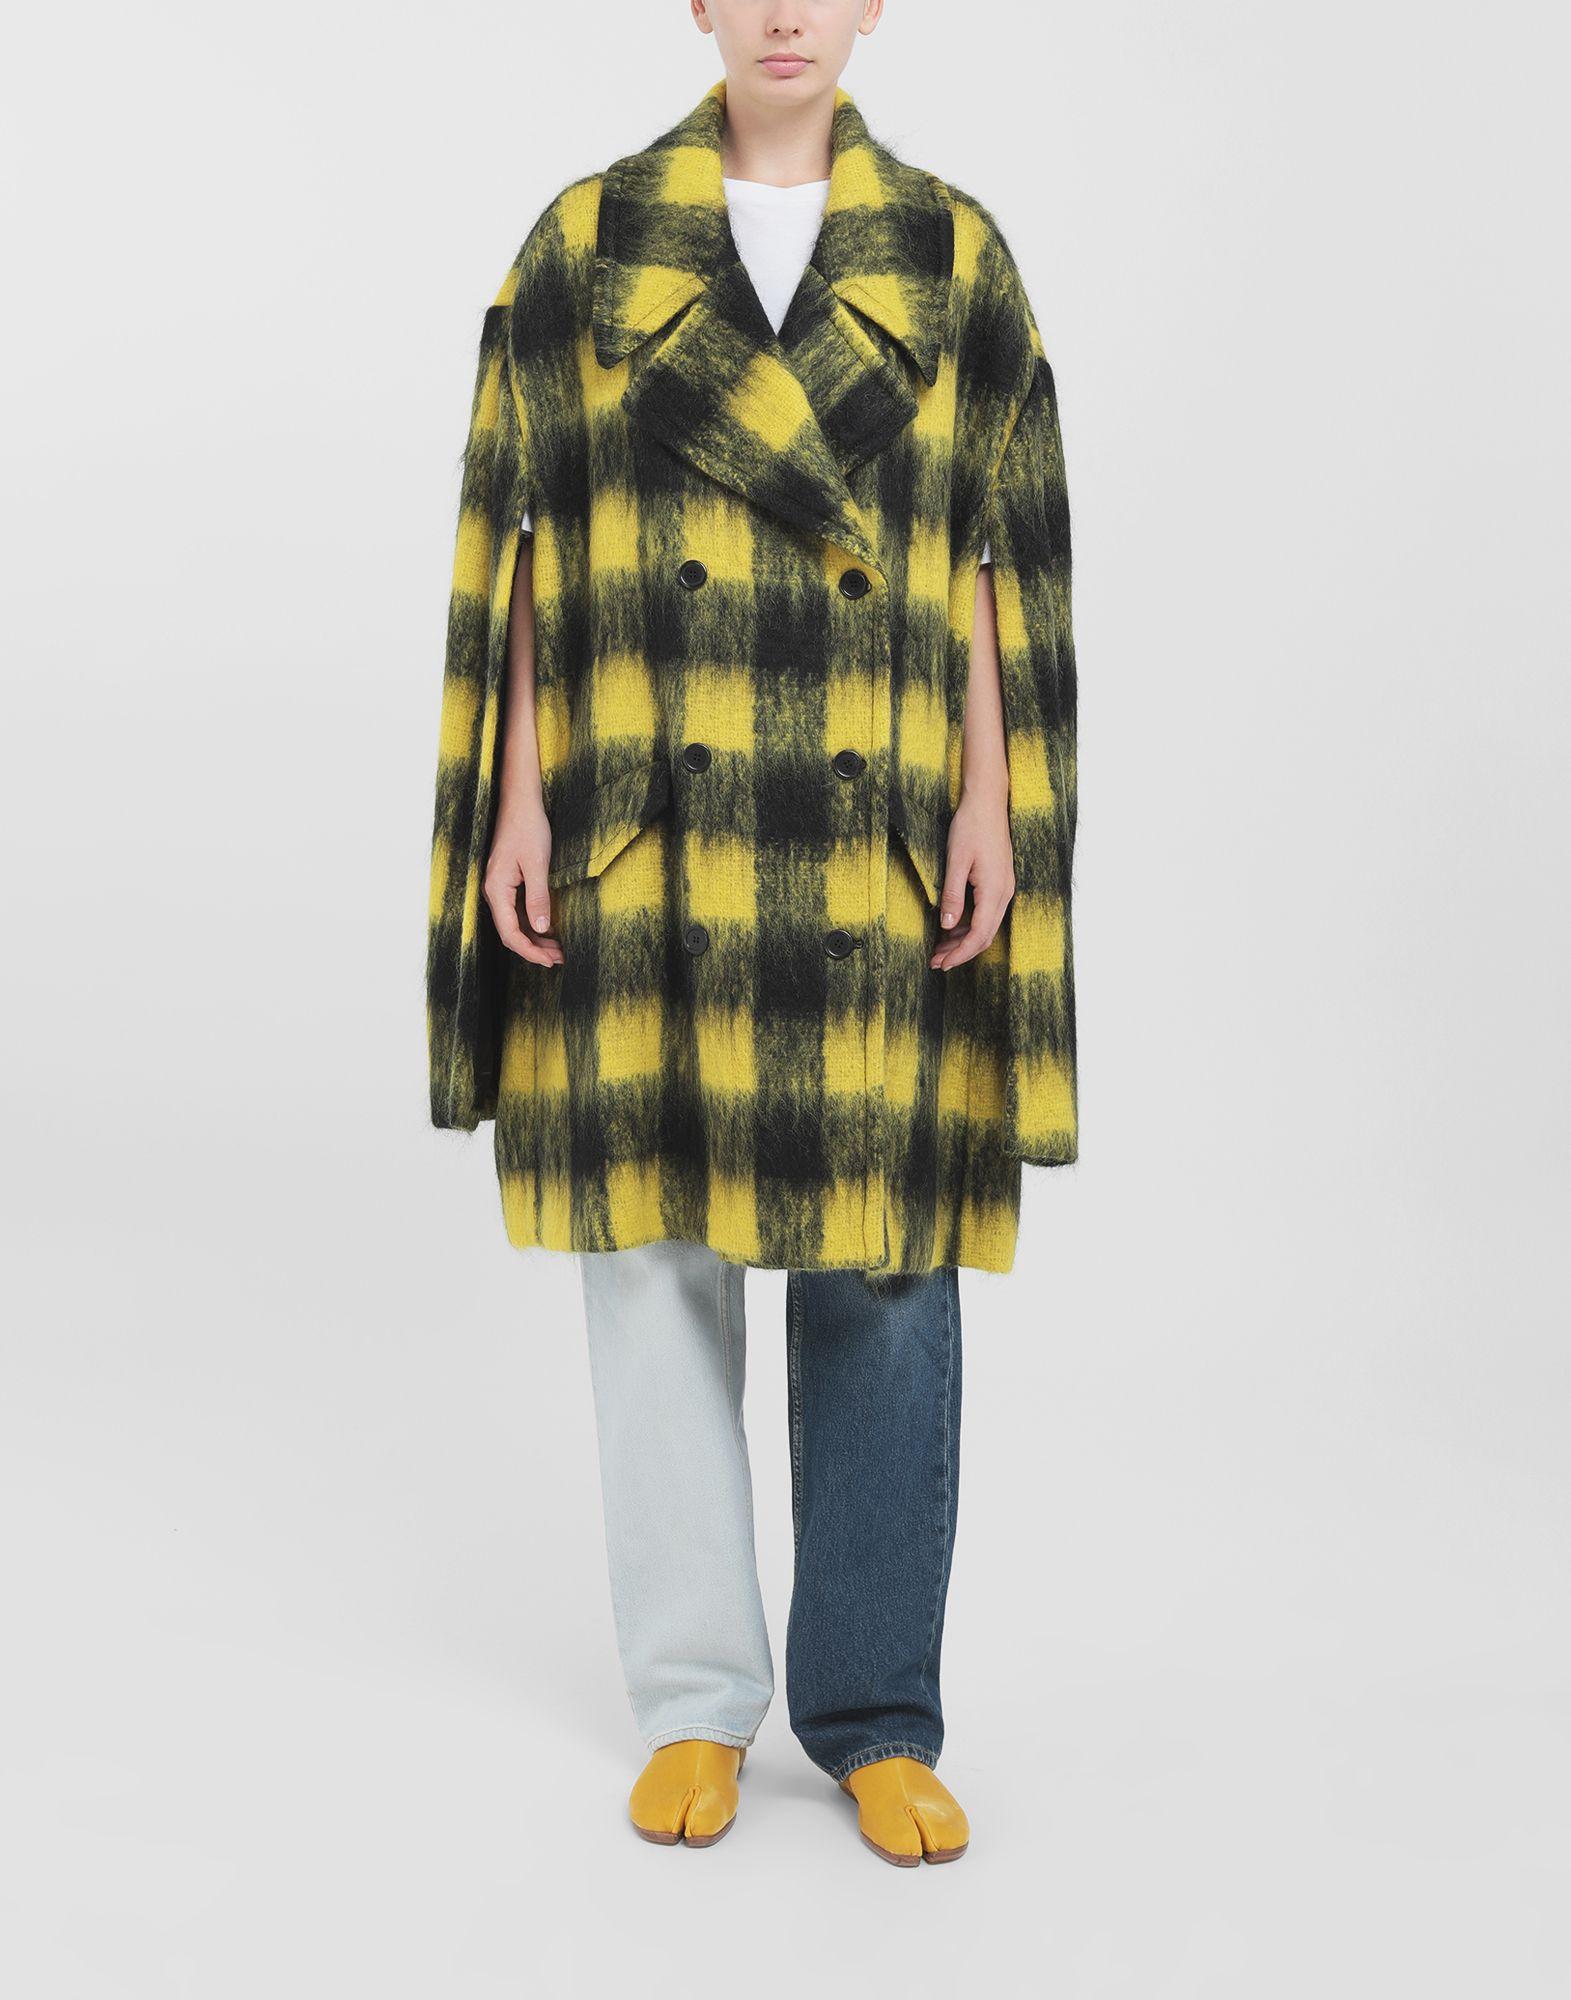 MAISON MARGIELA Mantel aus Mohair im Bolero-Stil Mantel Damen r